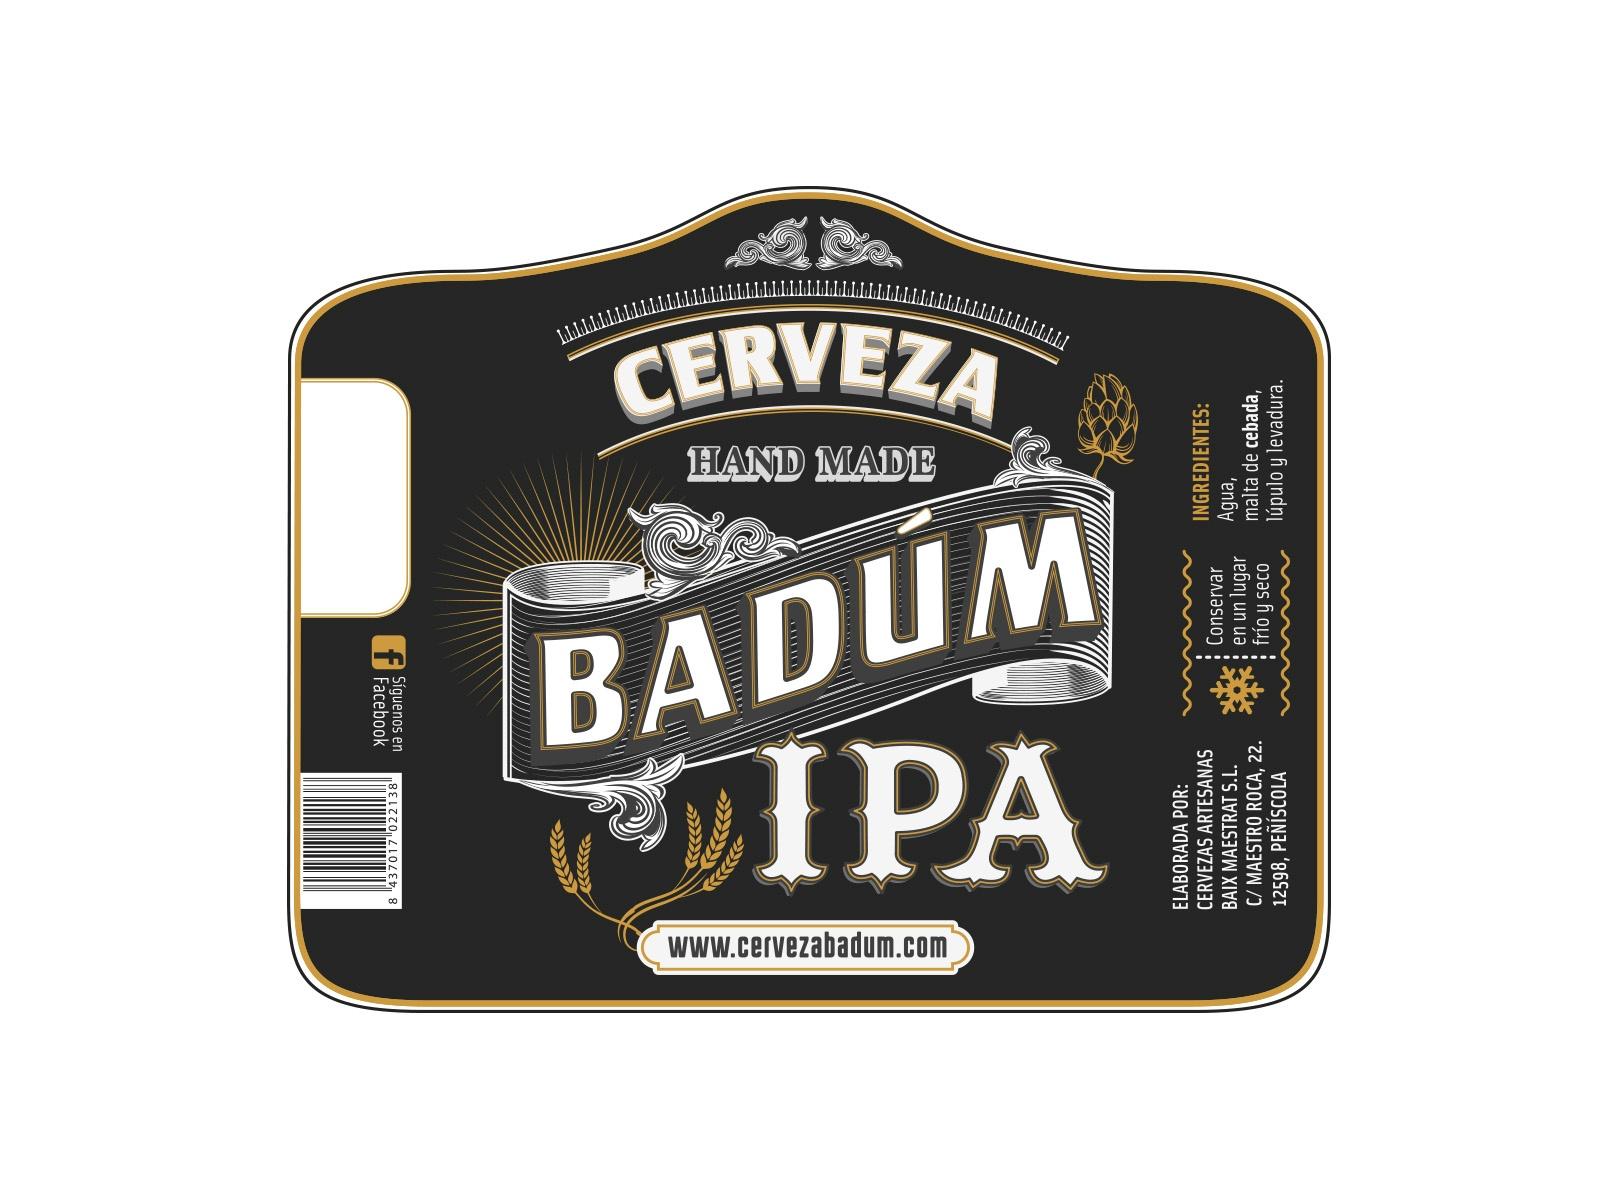 Etiqueta de cerveza IPA Badum Peñiscola